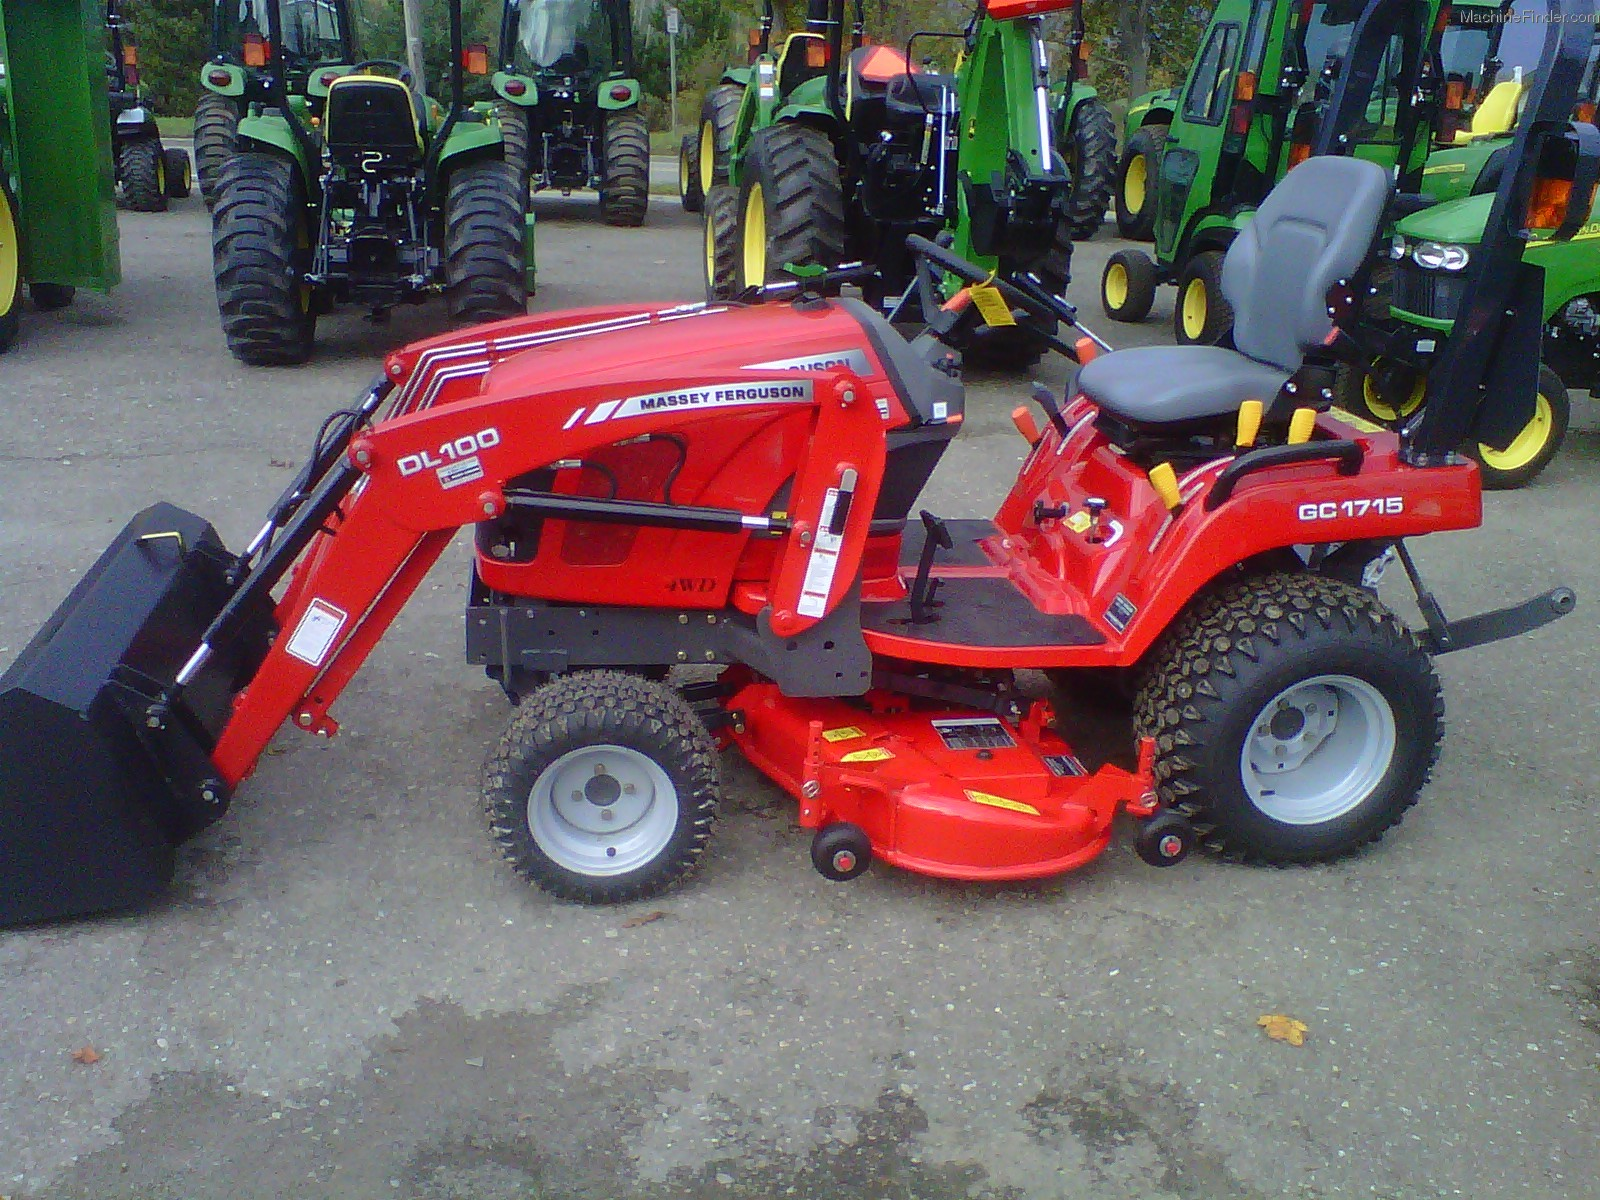 WRG-8679] Massey Ferguson Mf 1235 Compact Tractor Parts